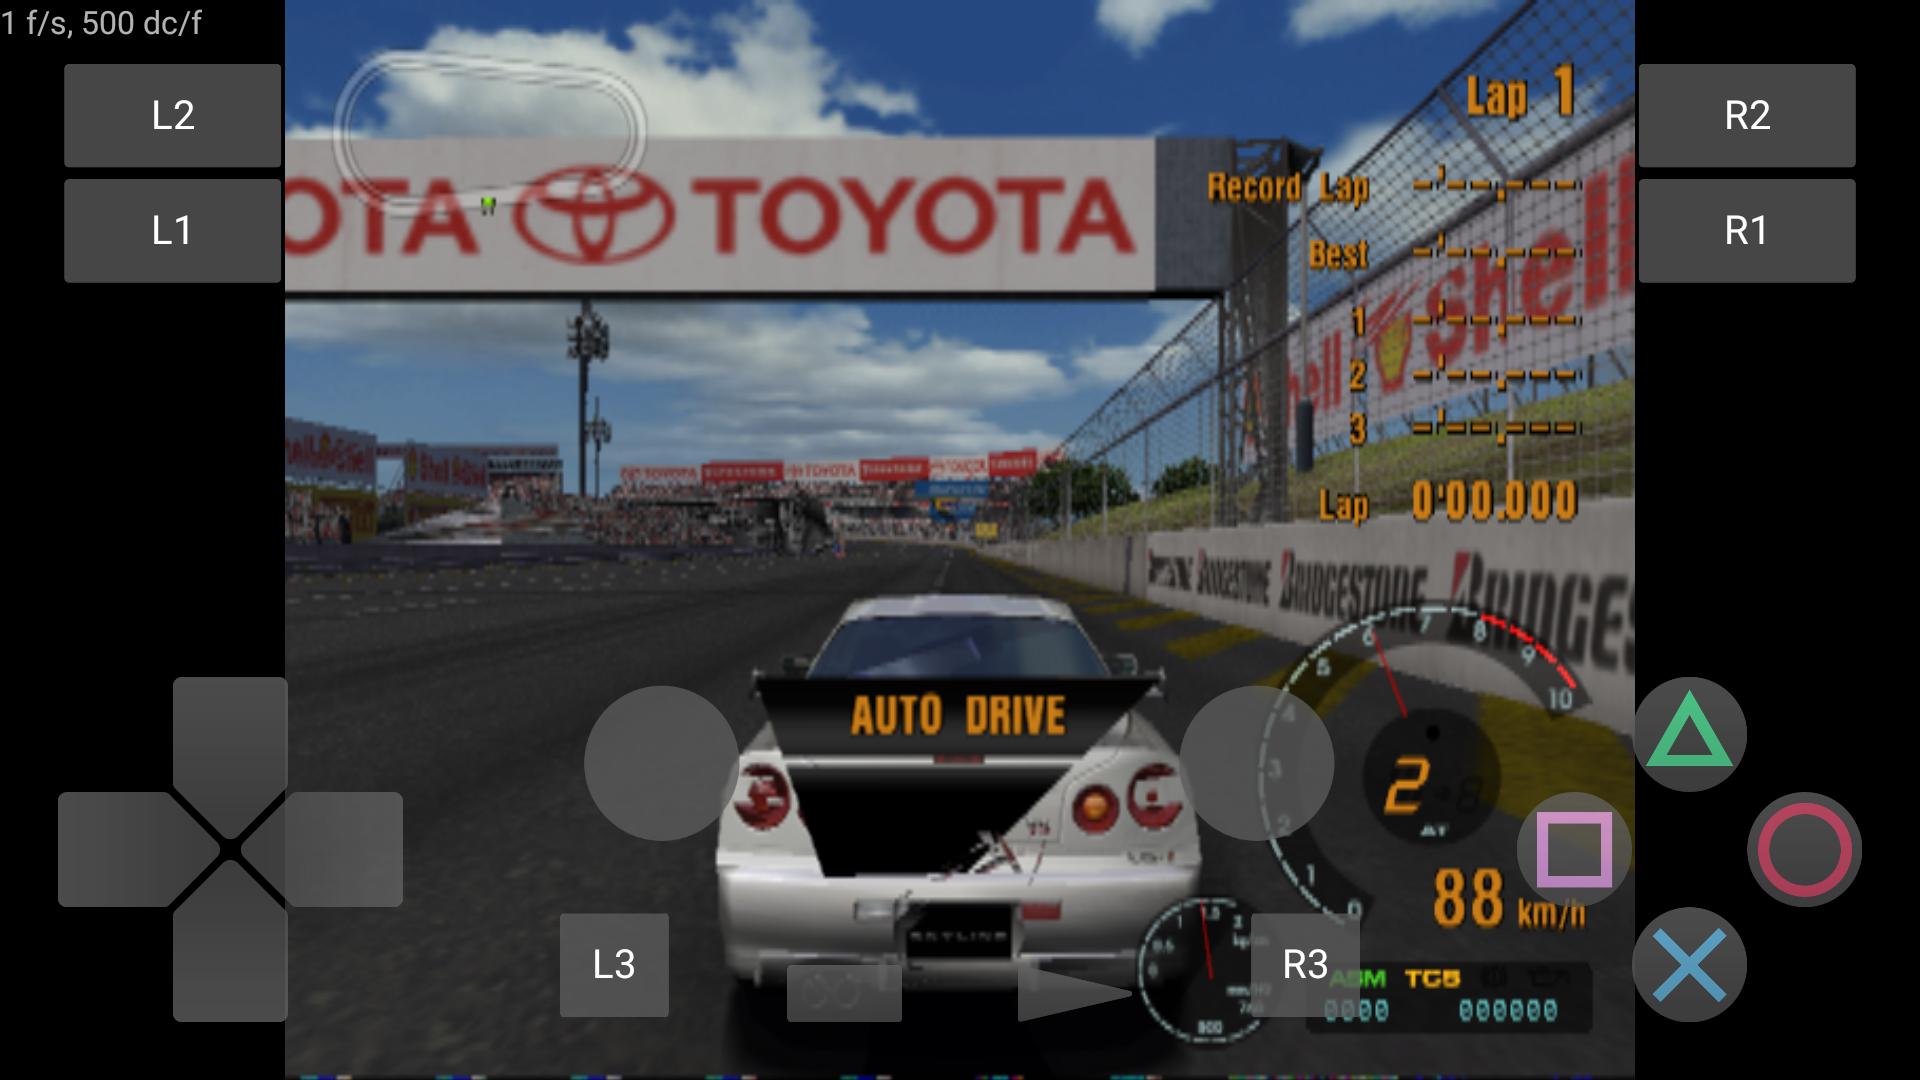 Эмулятор Playstation 2 для Android Игры  - screenshot_20170320-164255